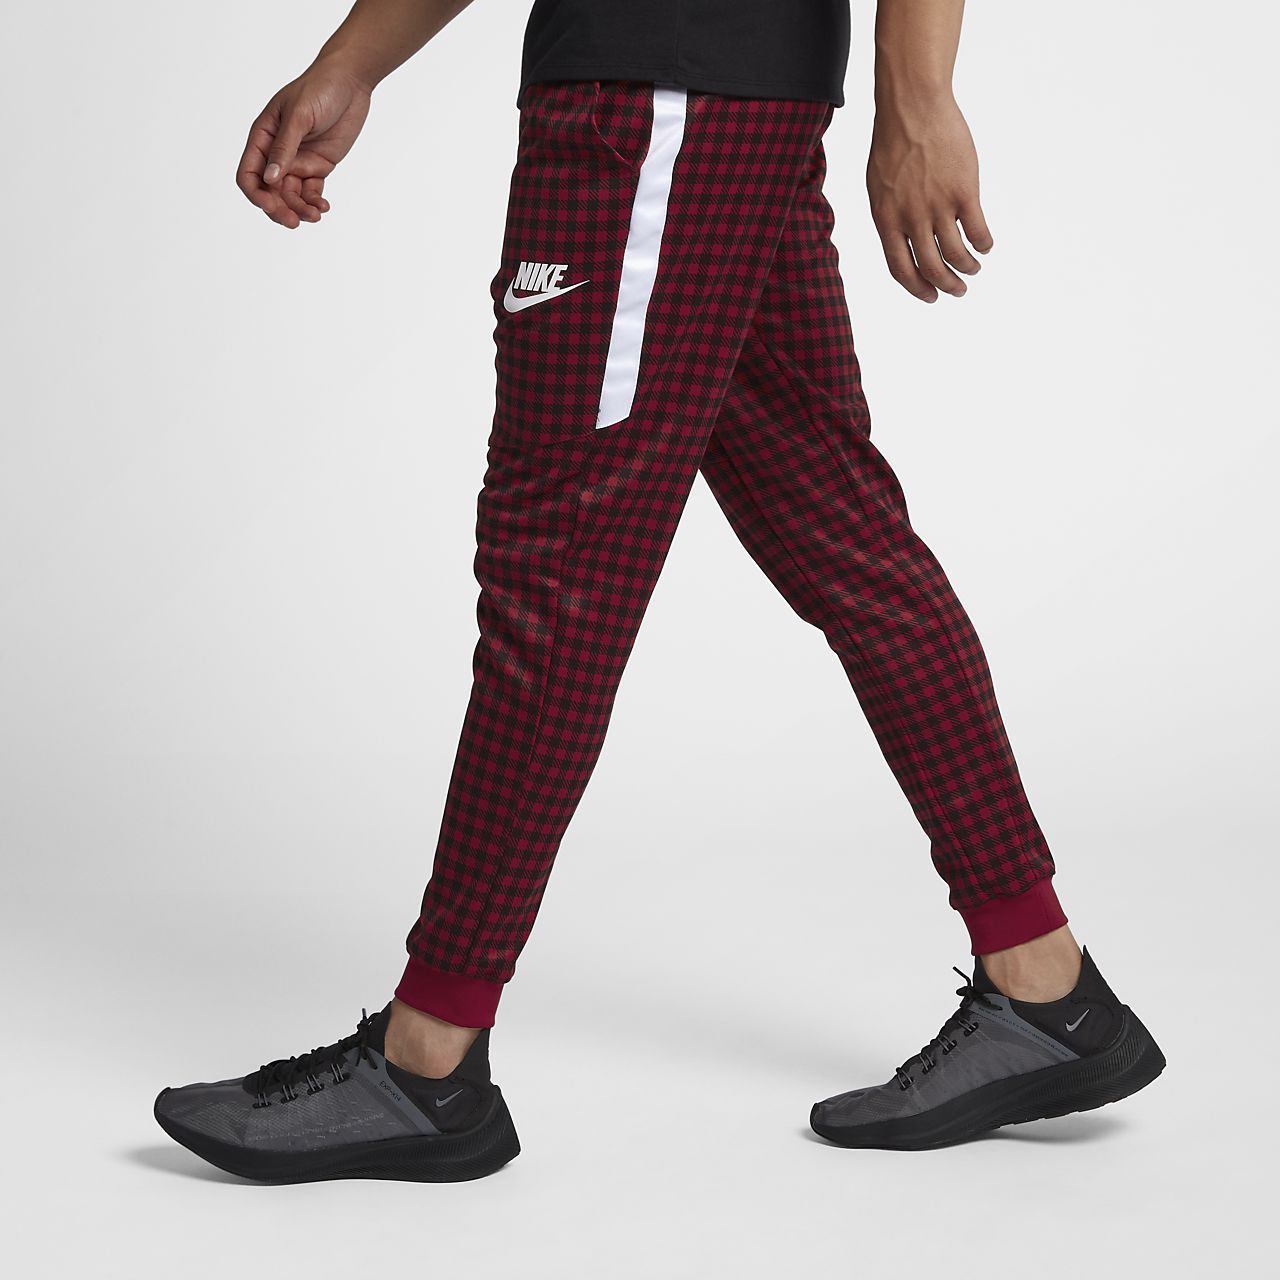 Джоггеры с графикой Nike Sportswear